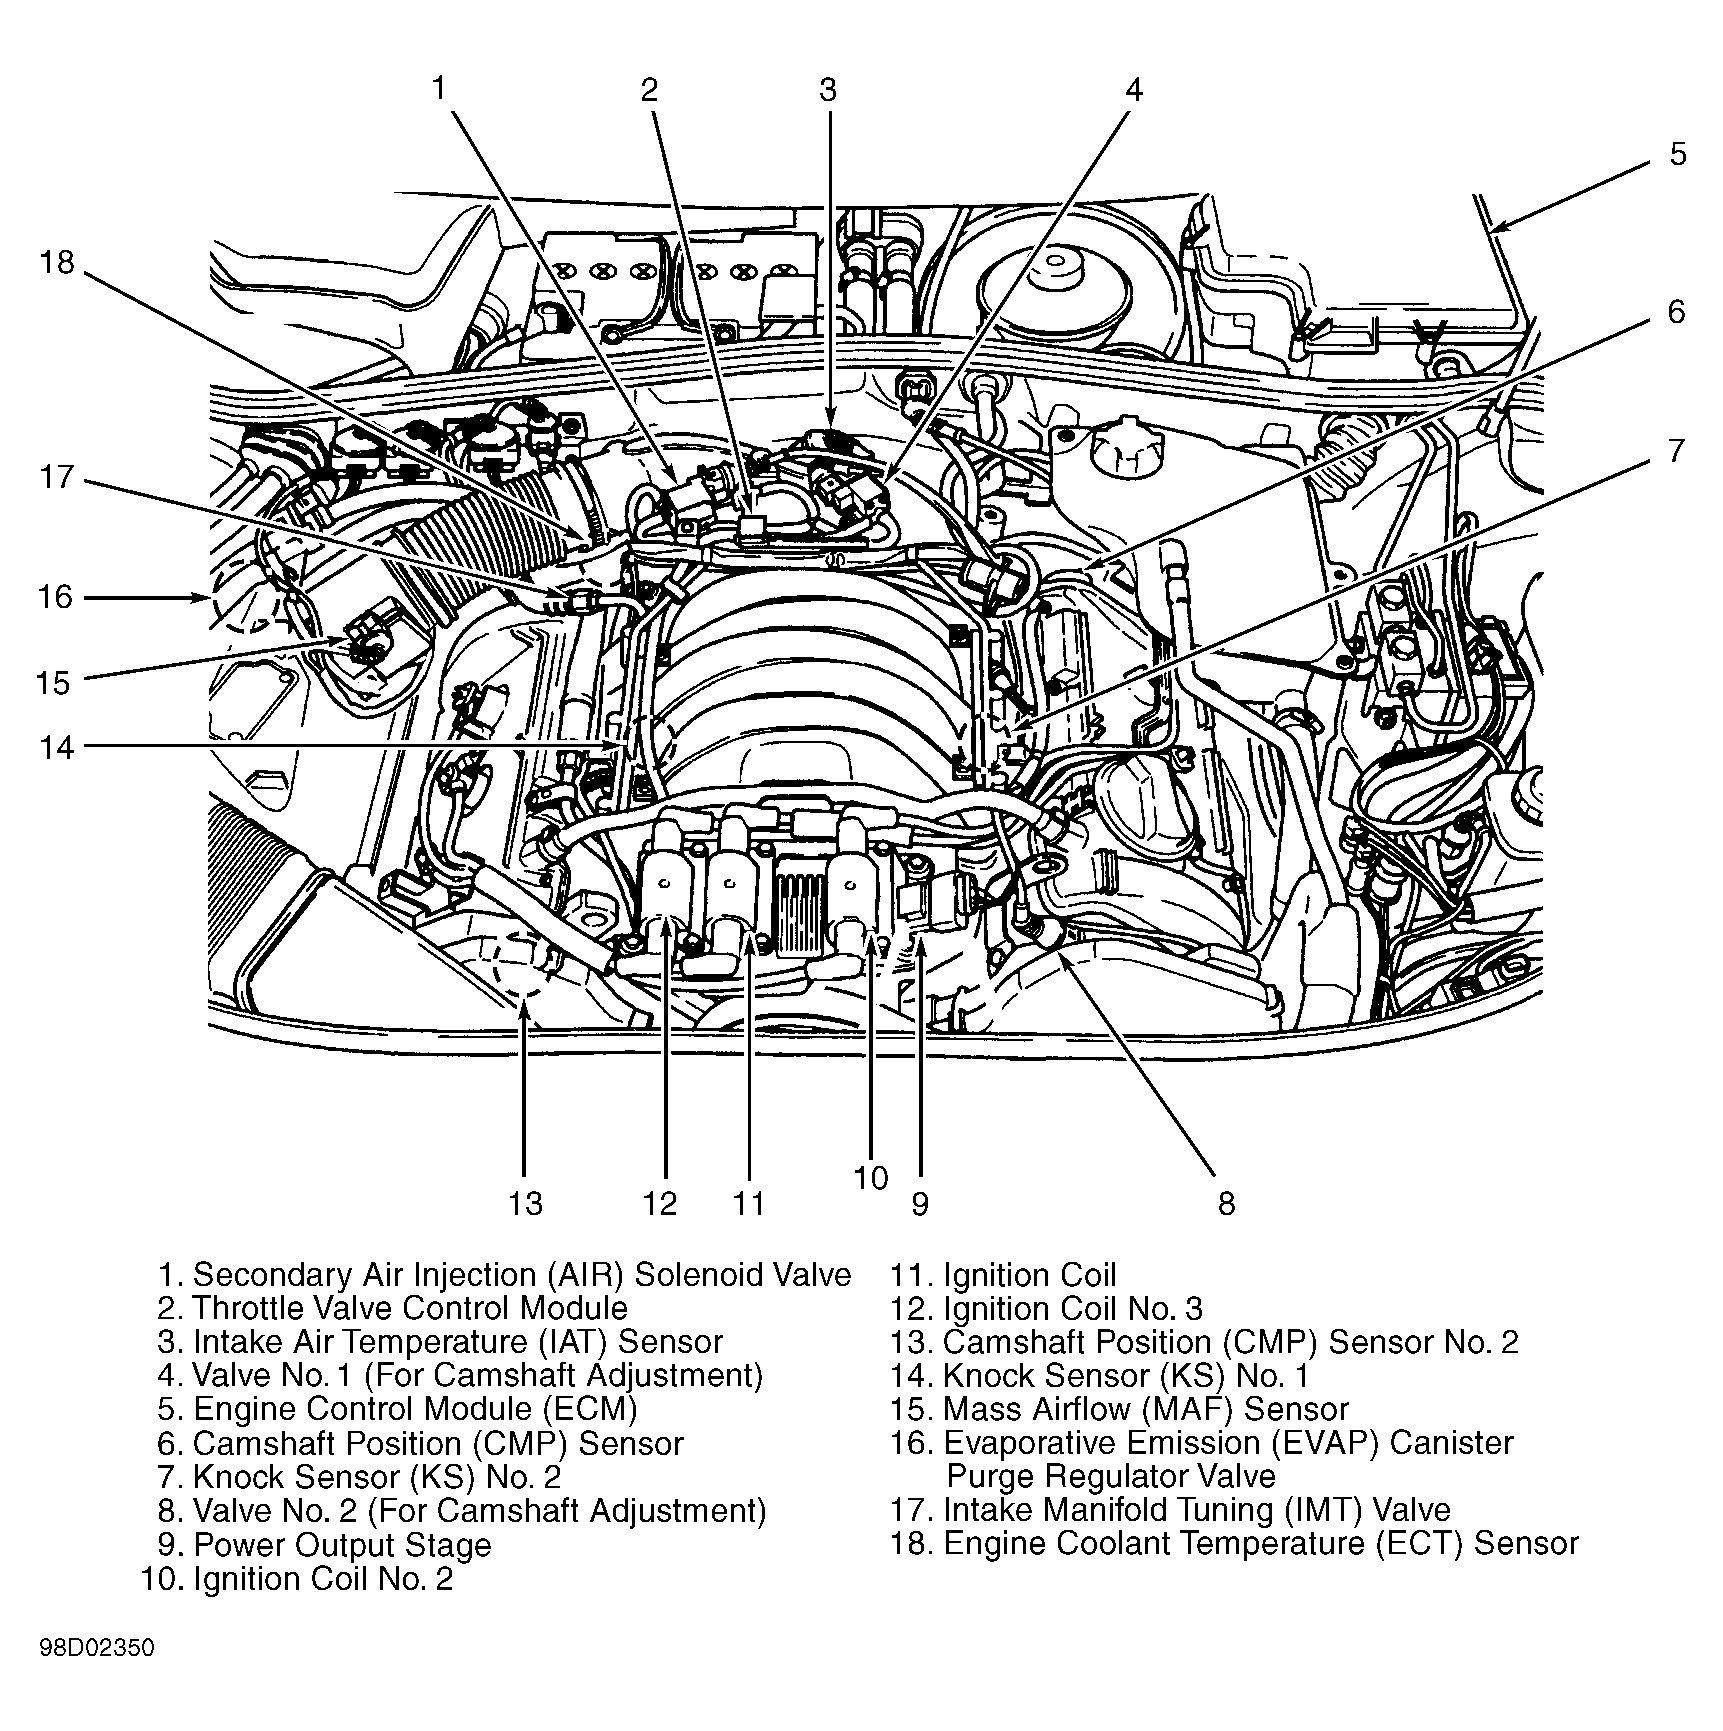 Unique Car Neon Wiring Diagram Diagram Diagramtemplate Diagramsample Jetta A2 Dodge Neon Autos